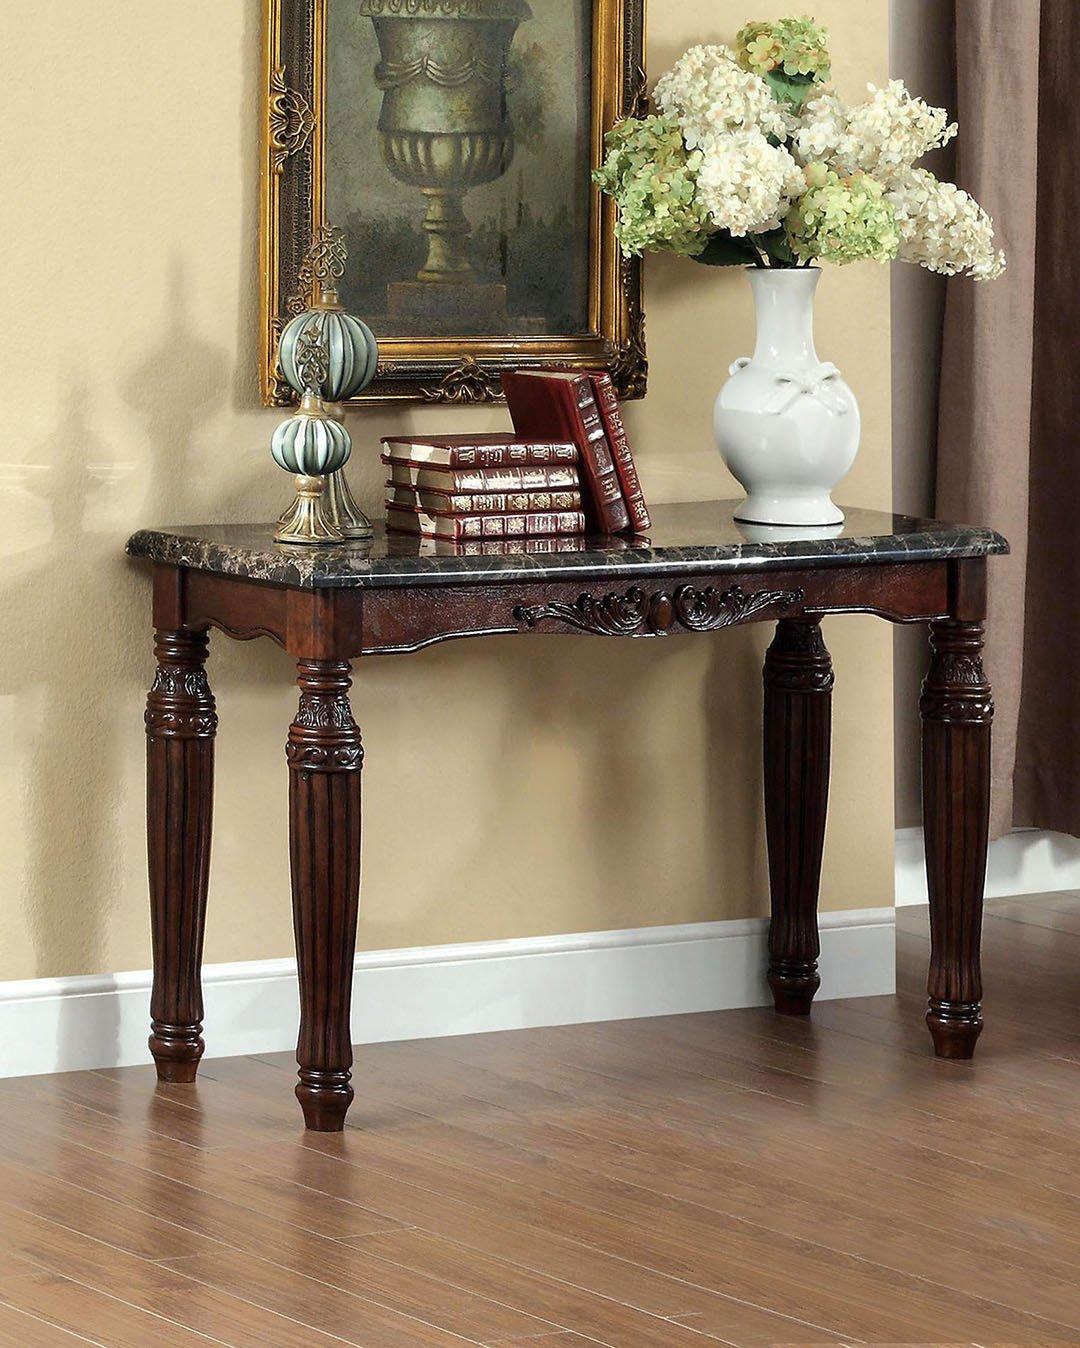 amazon com original sofa table traditional style kitchen dining rh amazon com Classic Sofa Table Ashley Furniture Console Sofa Table